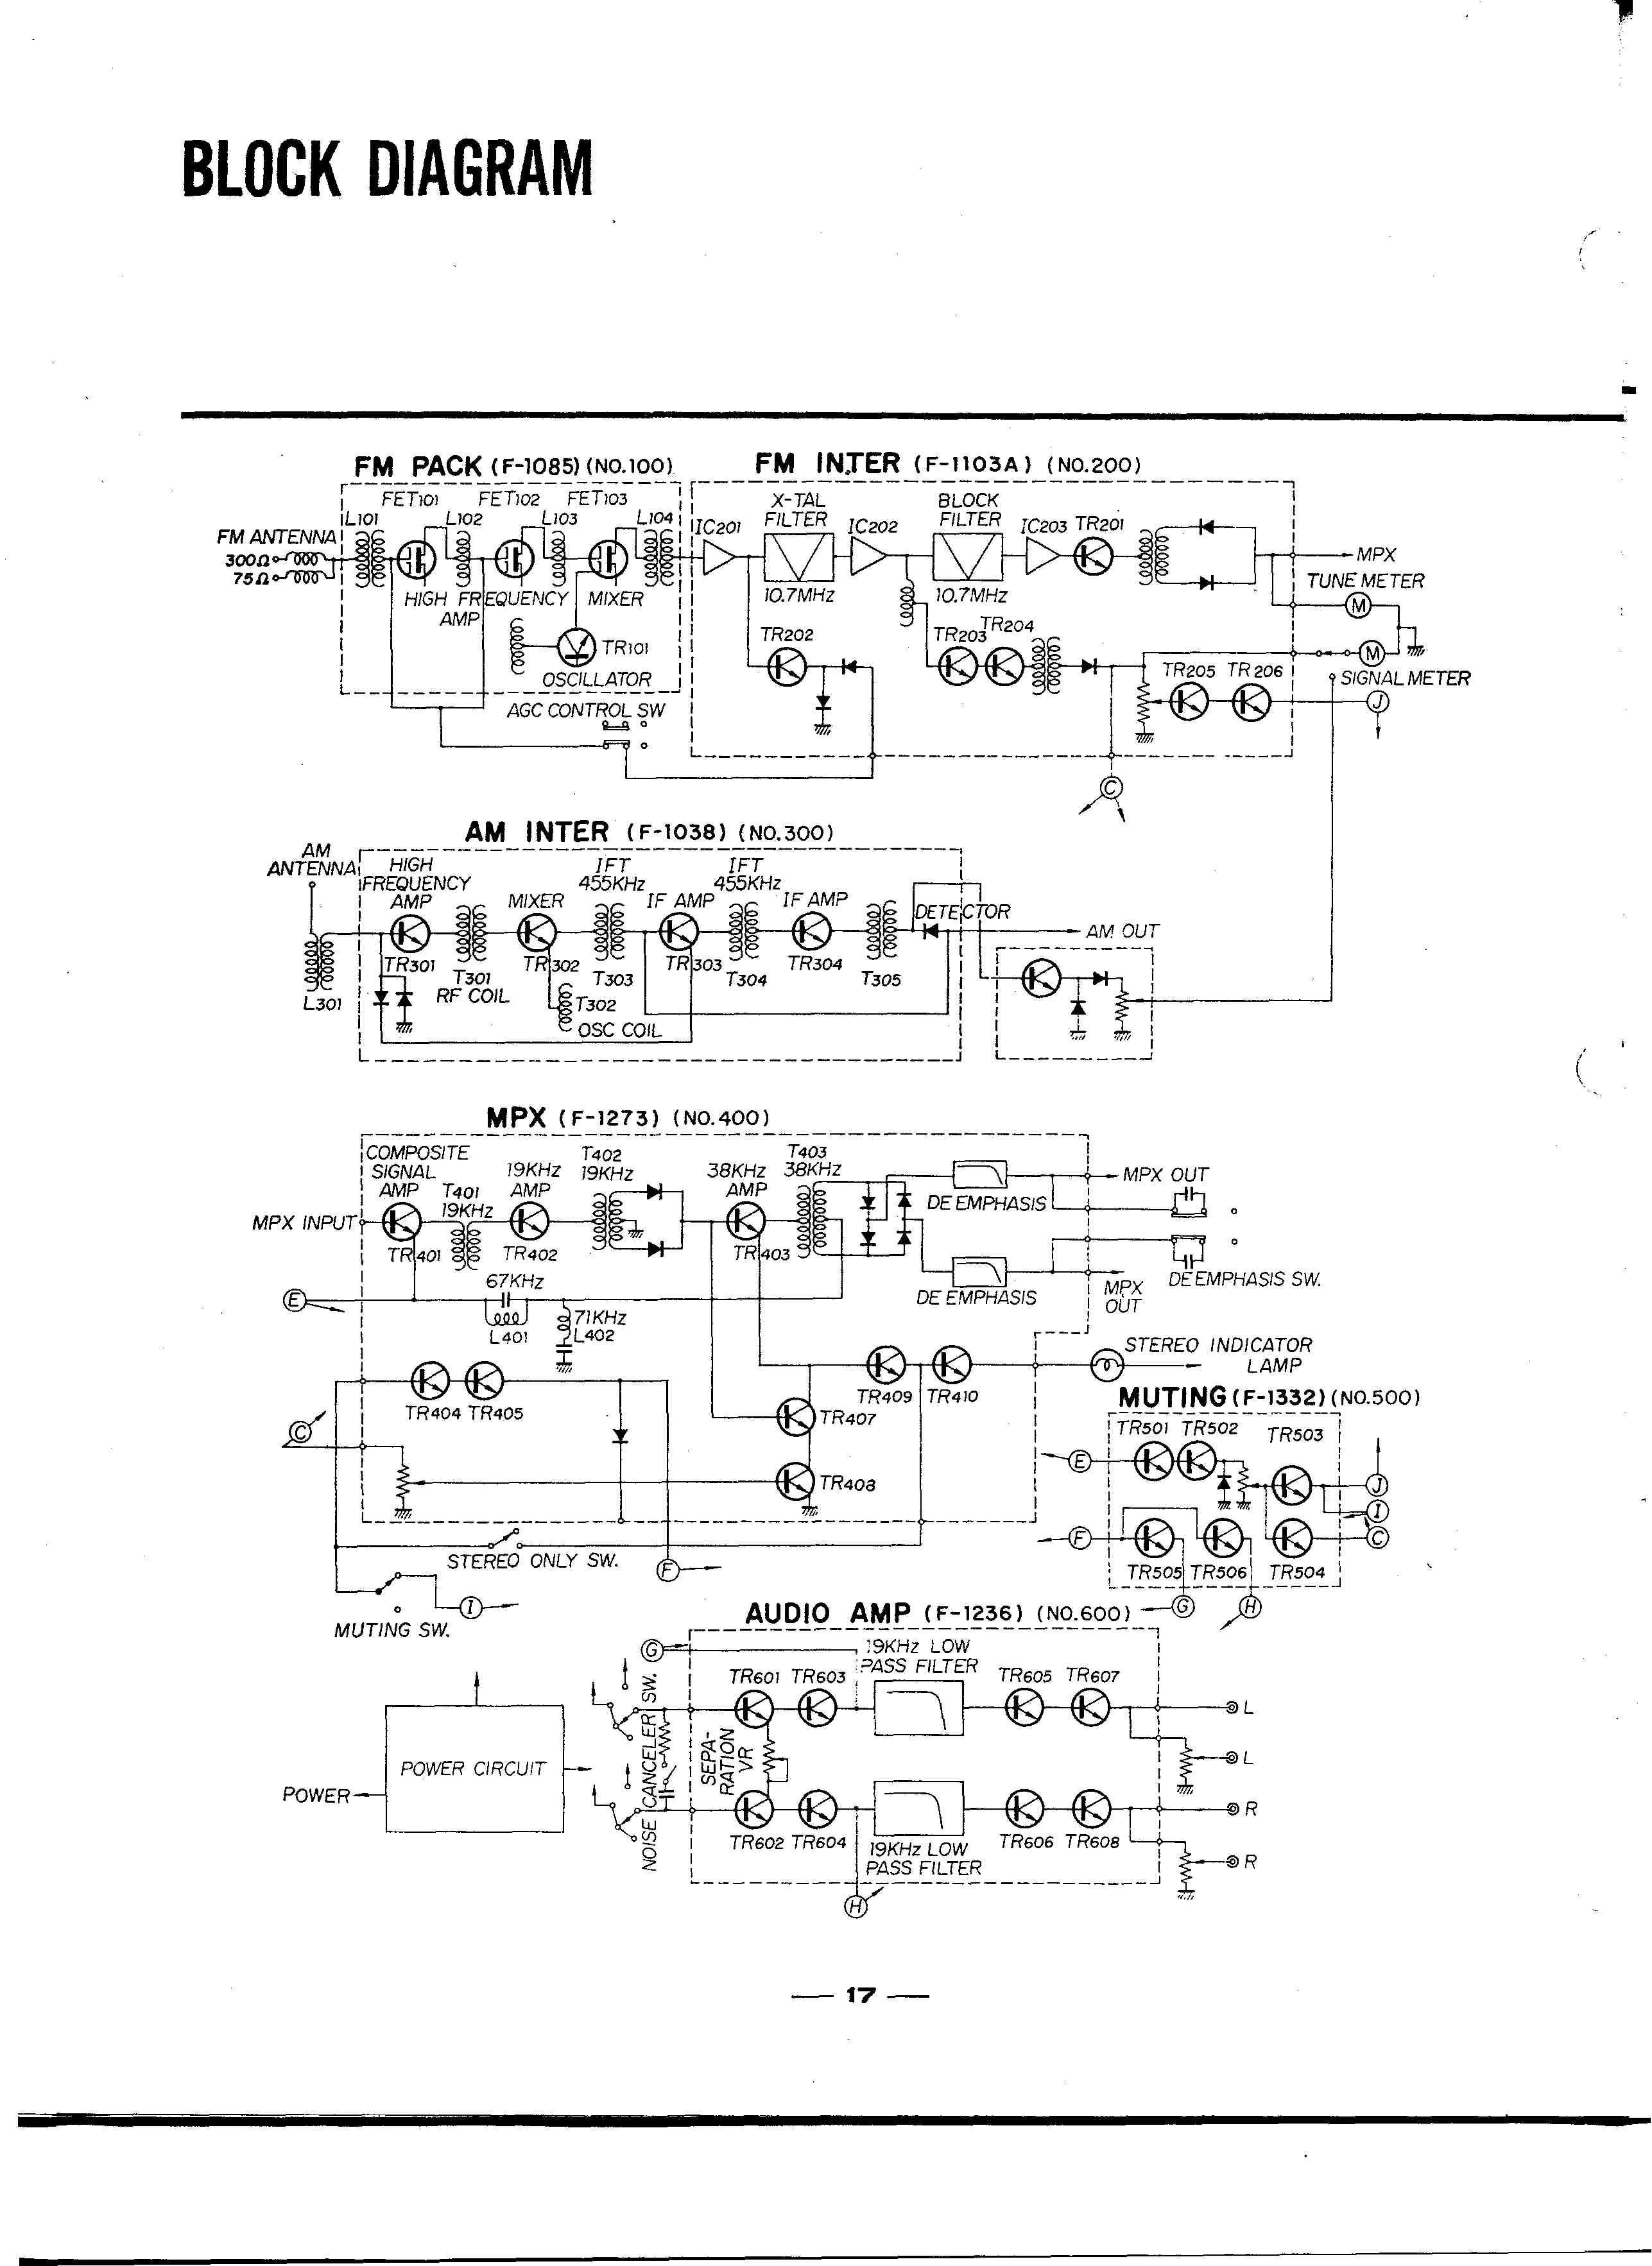 outdoor tv antenna wiring diagram 2005 pt cruiser radio stereo and for antennas